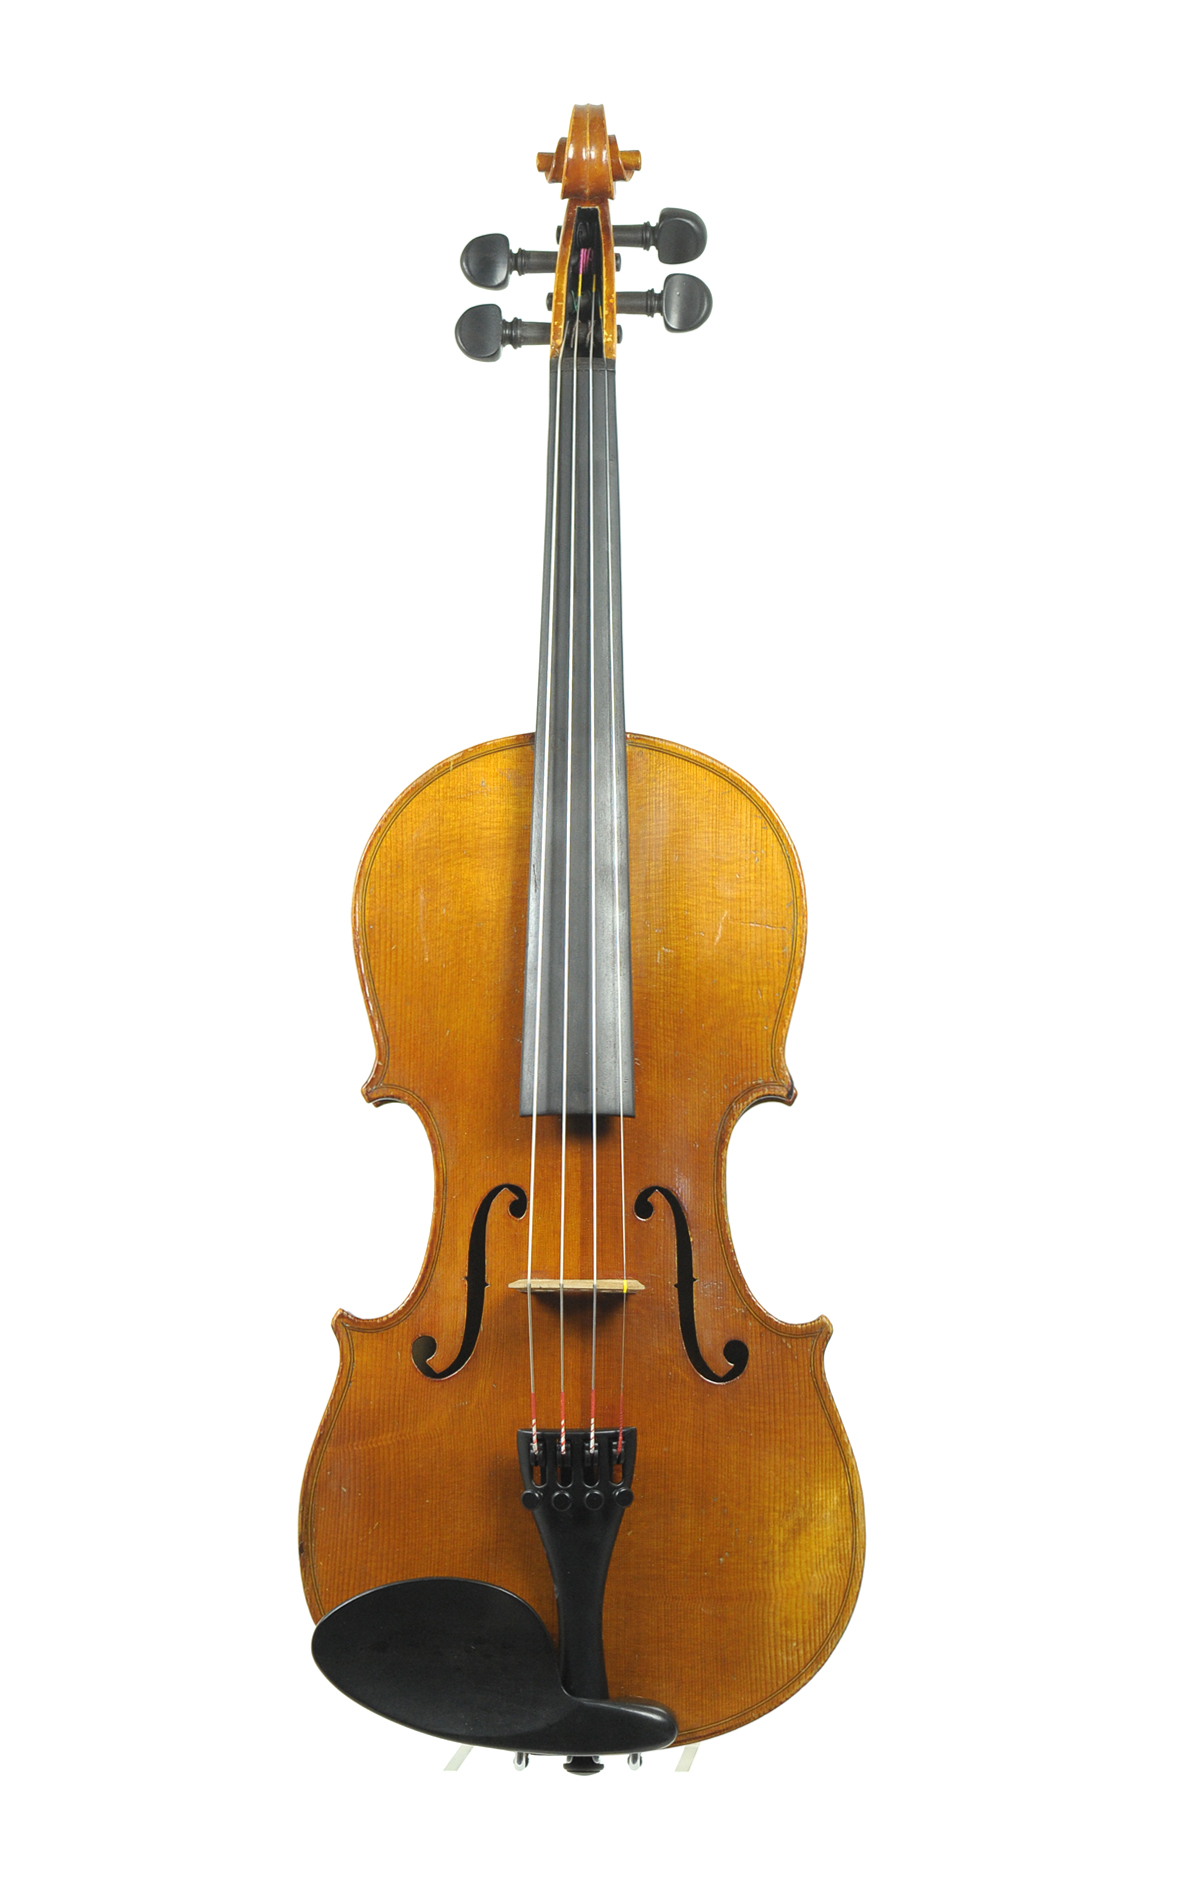 3 4 recommendable old mittenwald 3 4 violin children. Black Bedroom Furniture Sets. Home Design Ideas